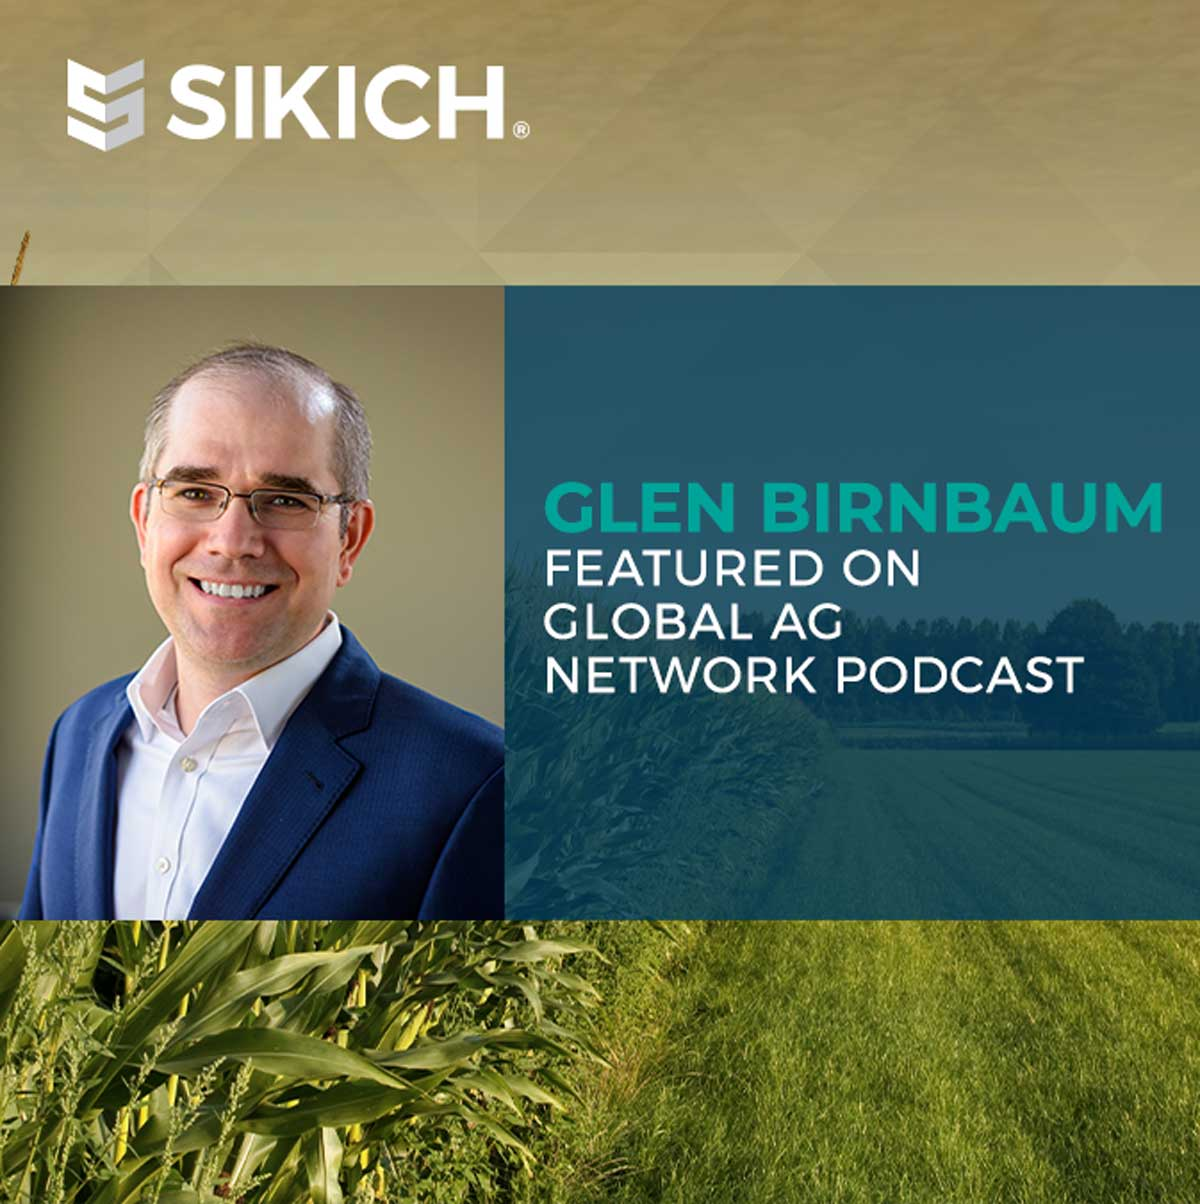 Glen-Birnbaum-Featured-on-Global-Ag-Network-Podcast